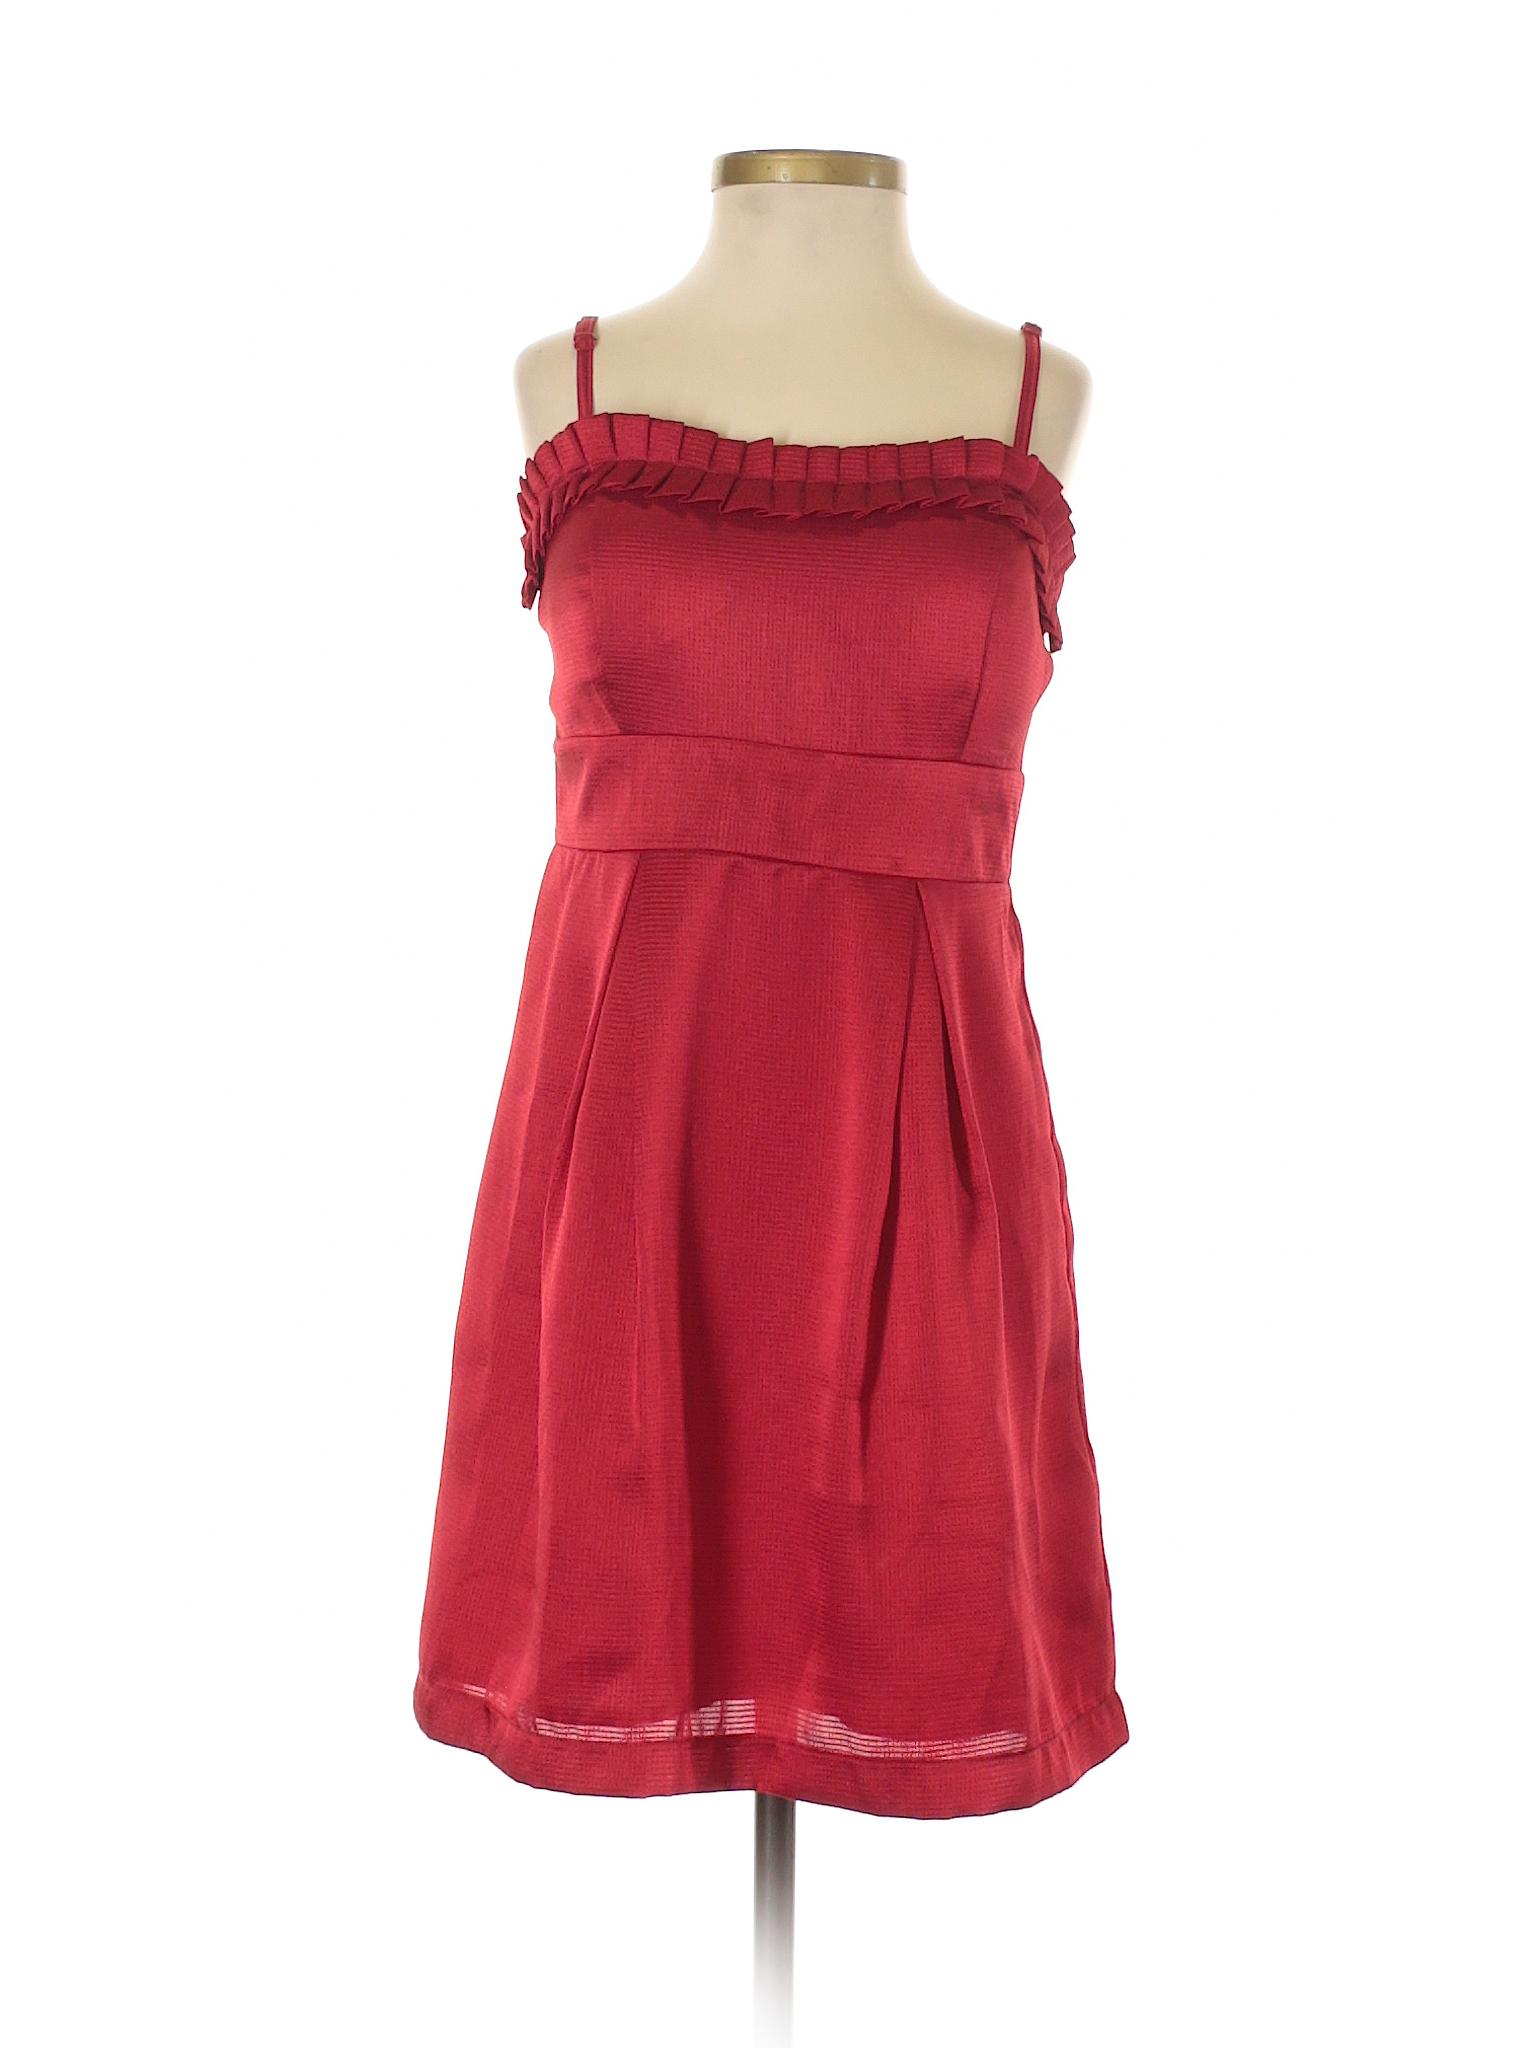 Casual Dress Forever 21 winter Boutique 6fZgwqtn